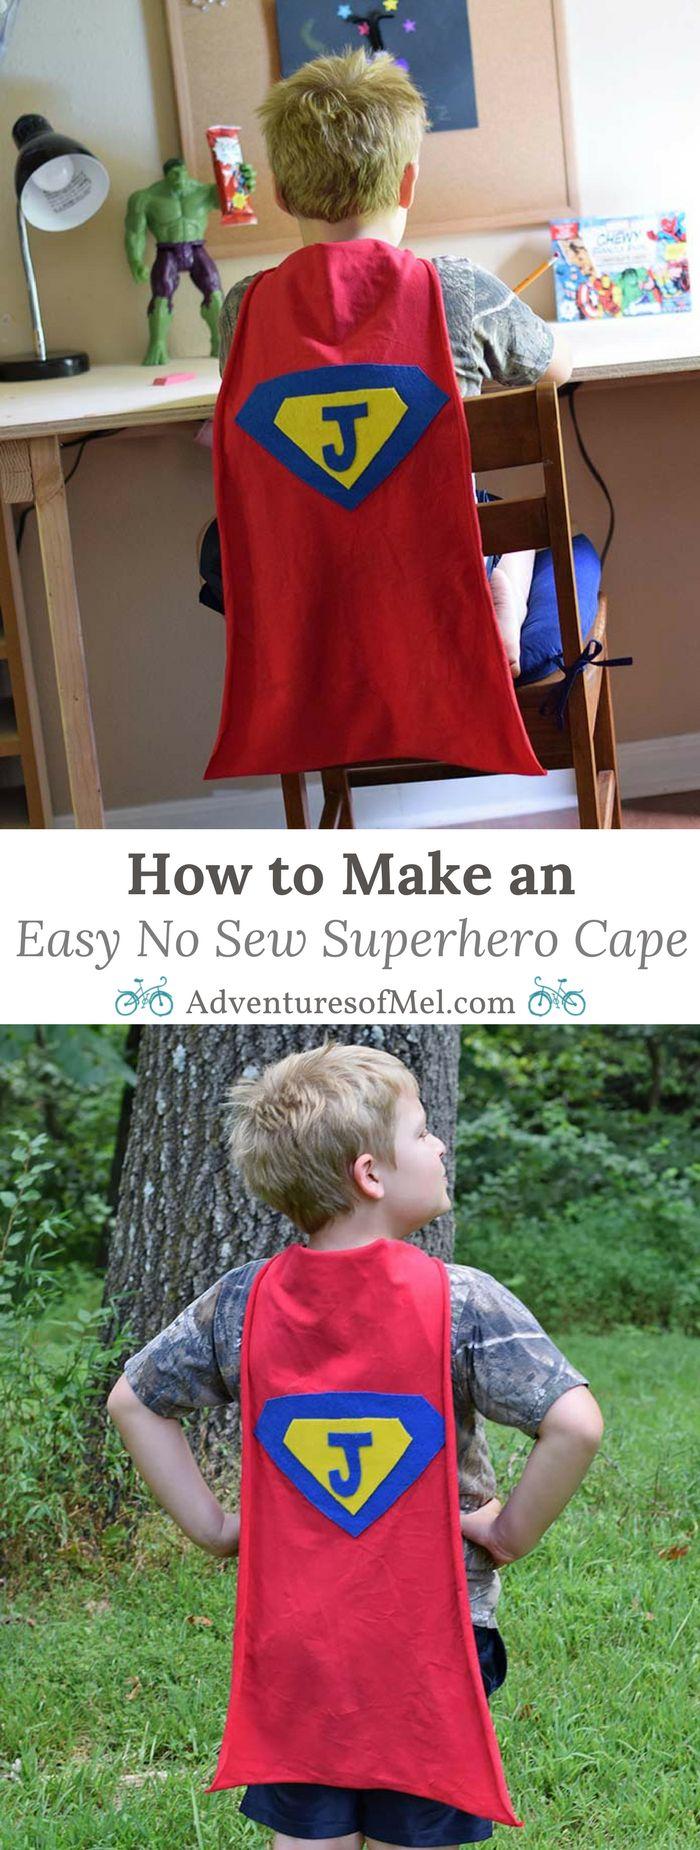 Best 25+ No sew cape ideas only on Pinterest | No capes, Superhero ...